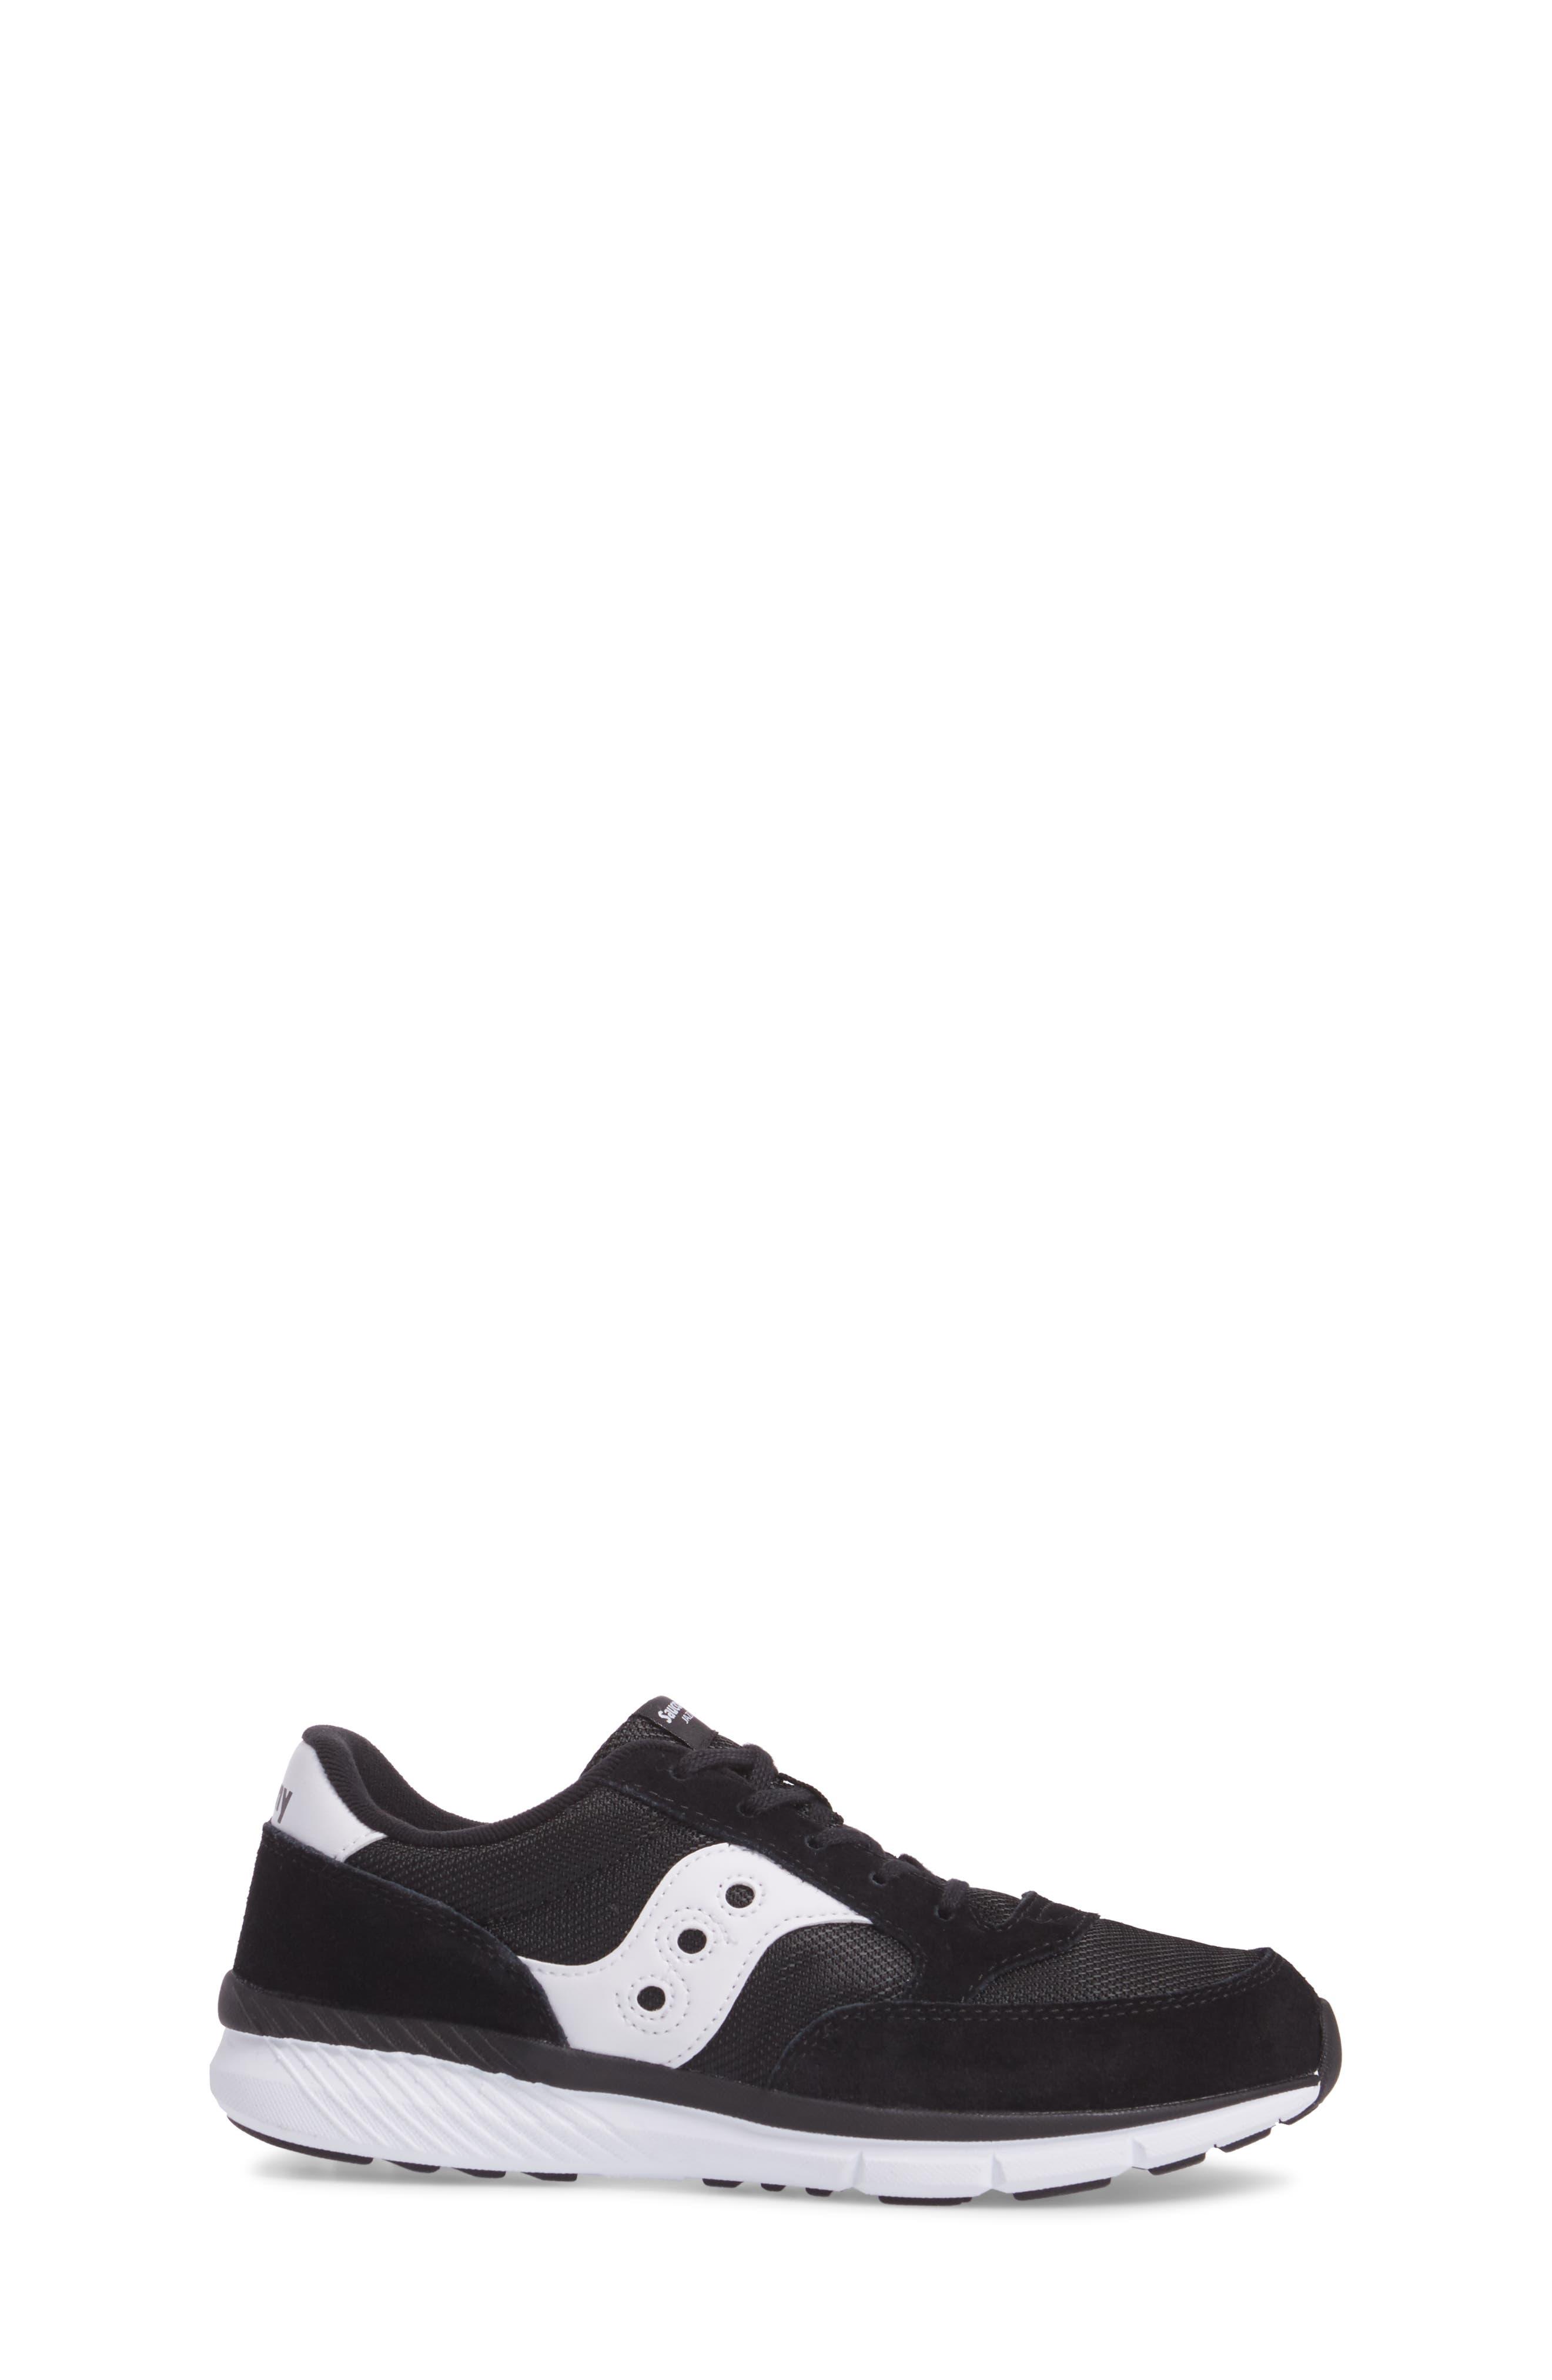 Jazz Lite Athletic Shoe,                             Alternate thumbnail 3, color,                             Black/ Black